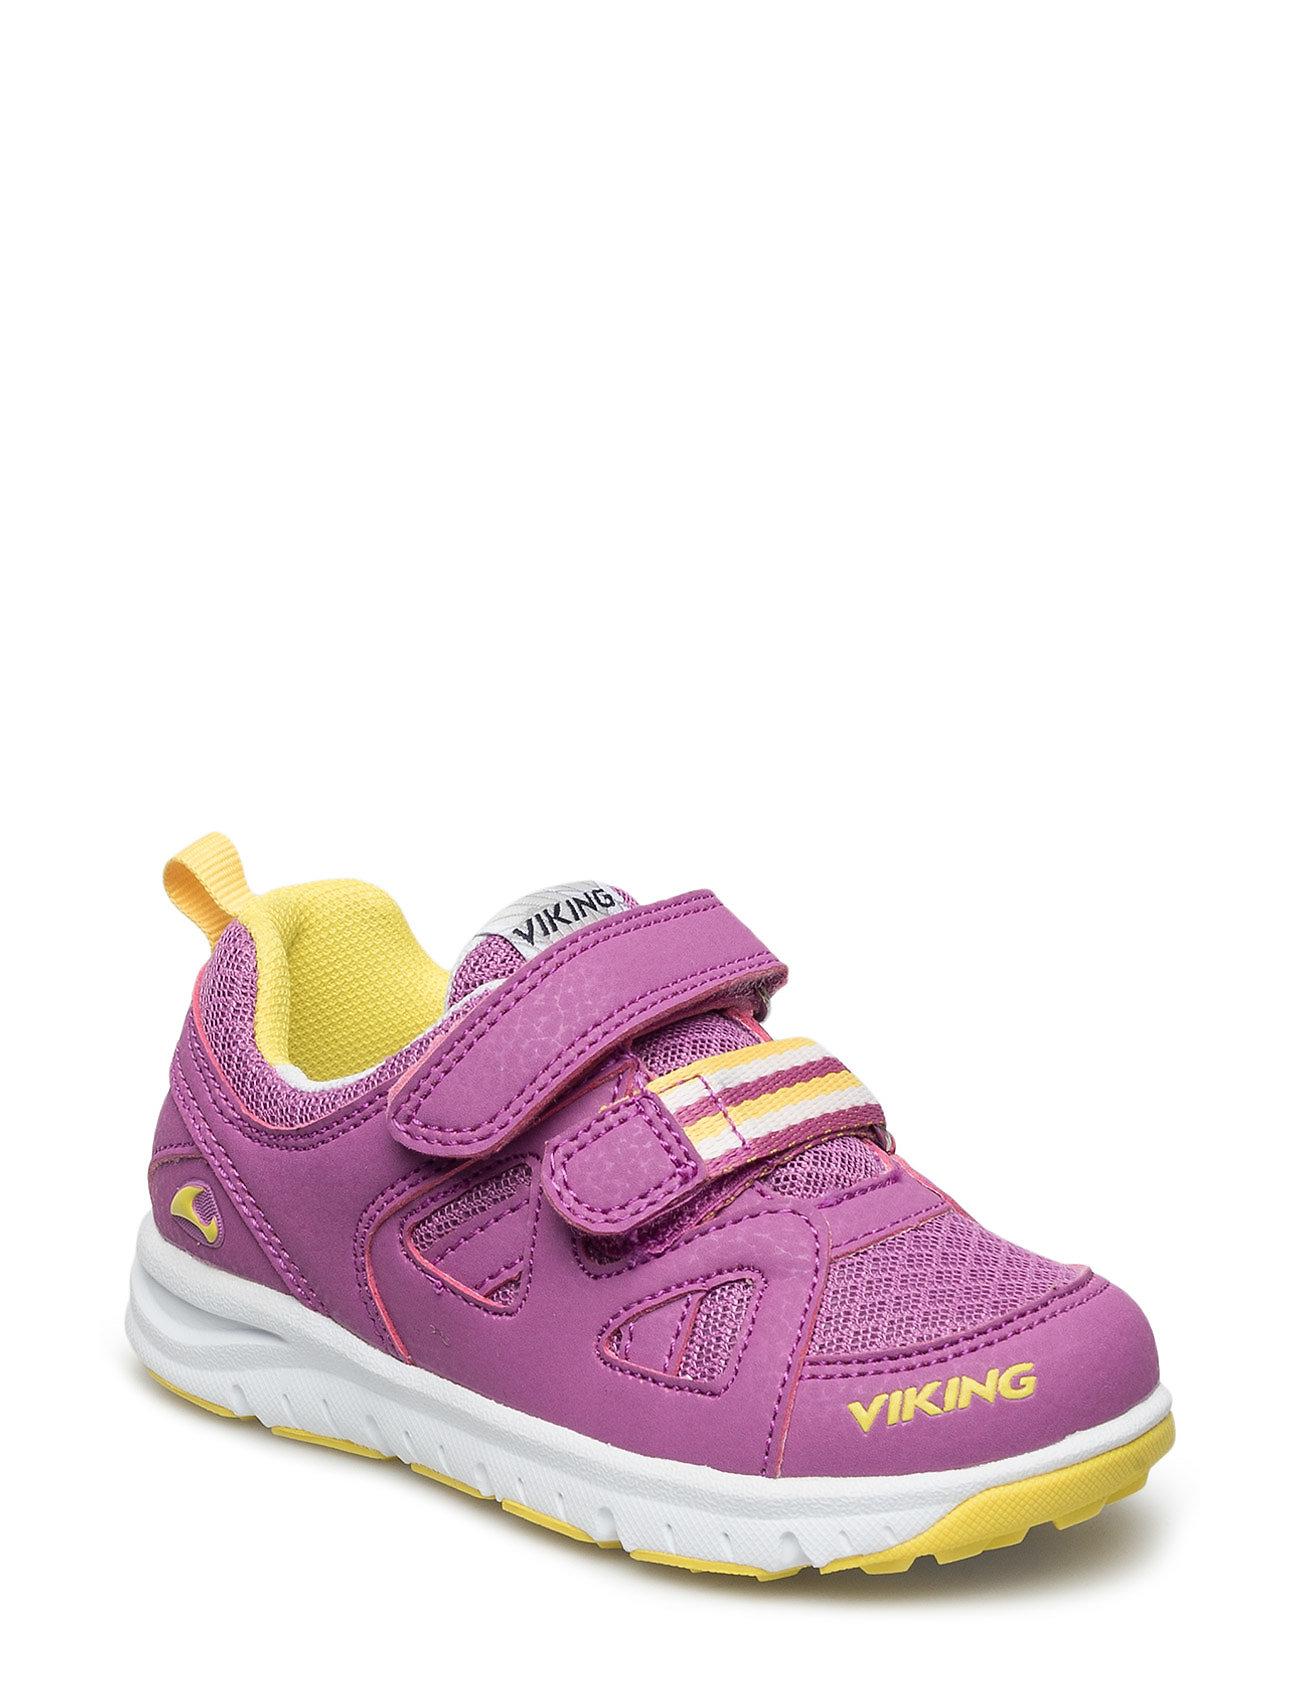 Riptide Ii Viking Sko & Sneakers til Børn i